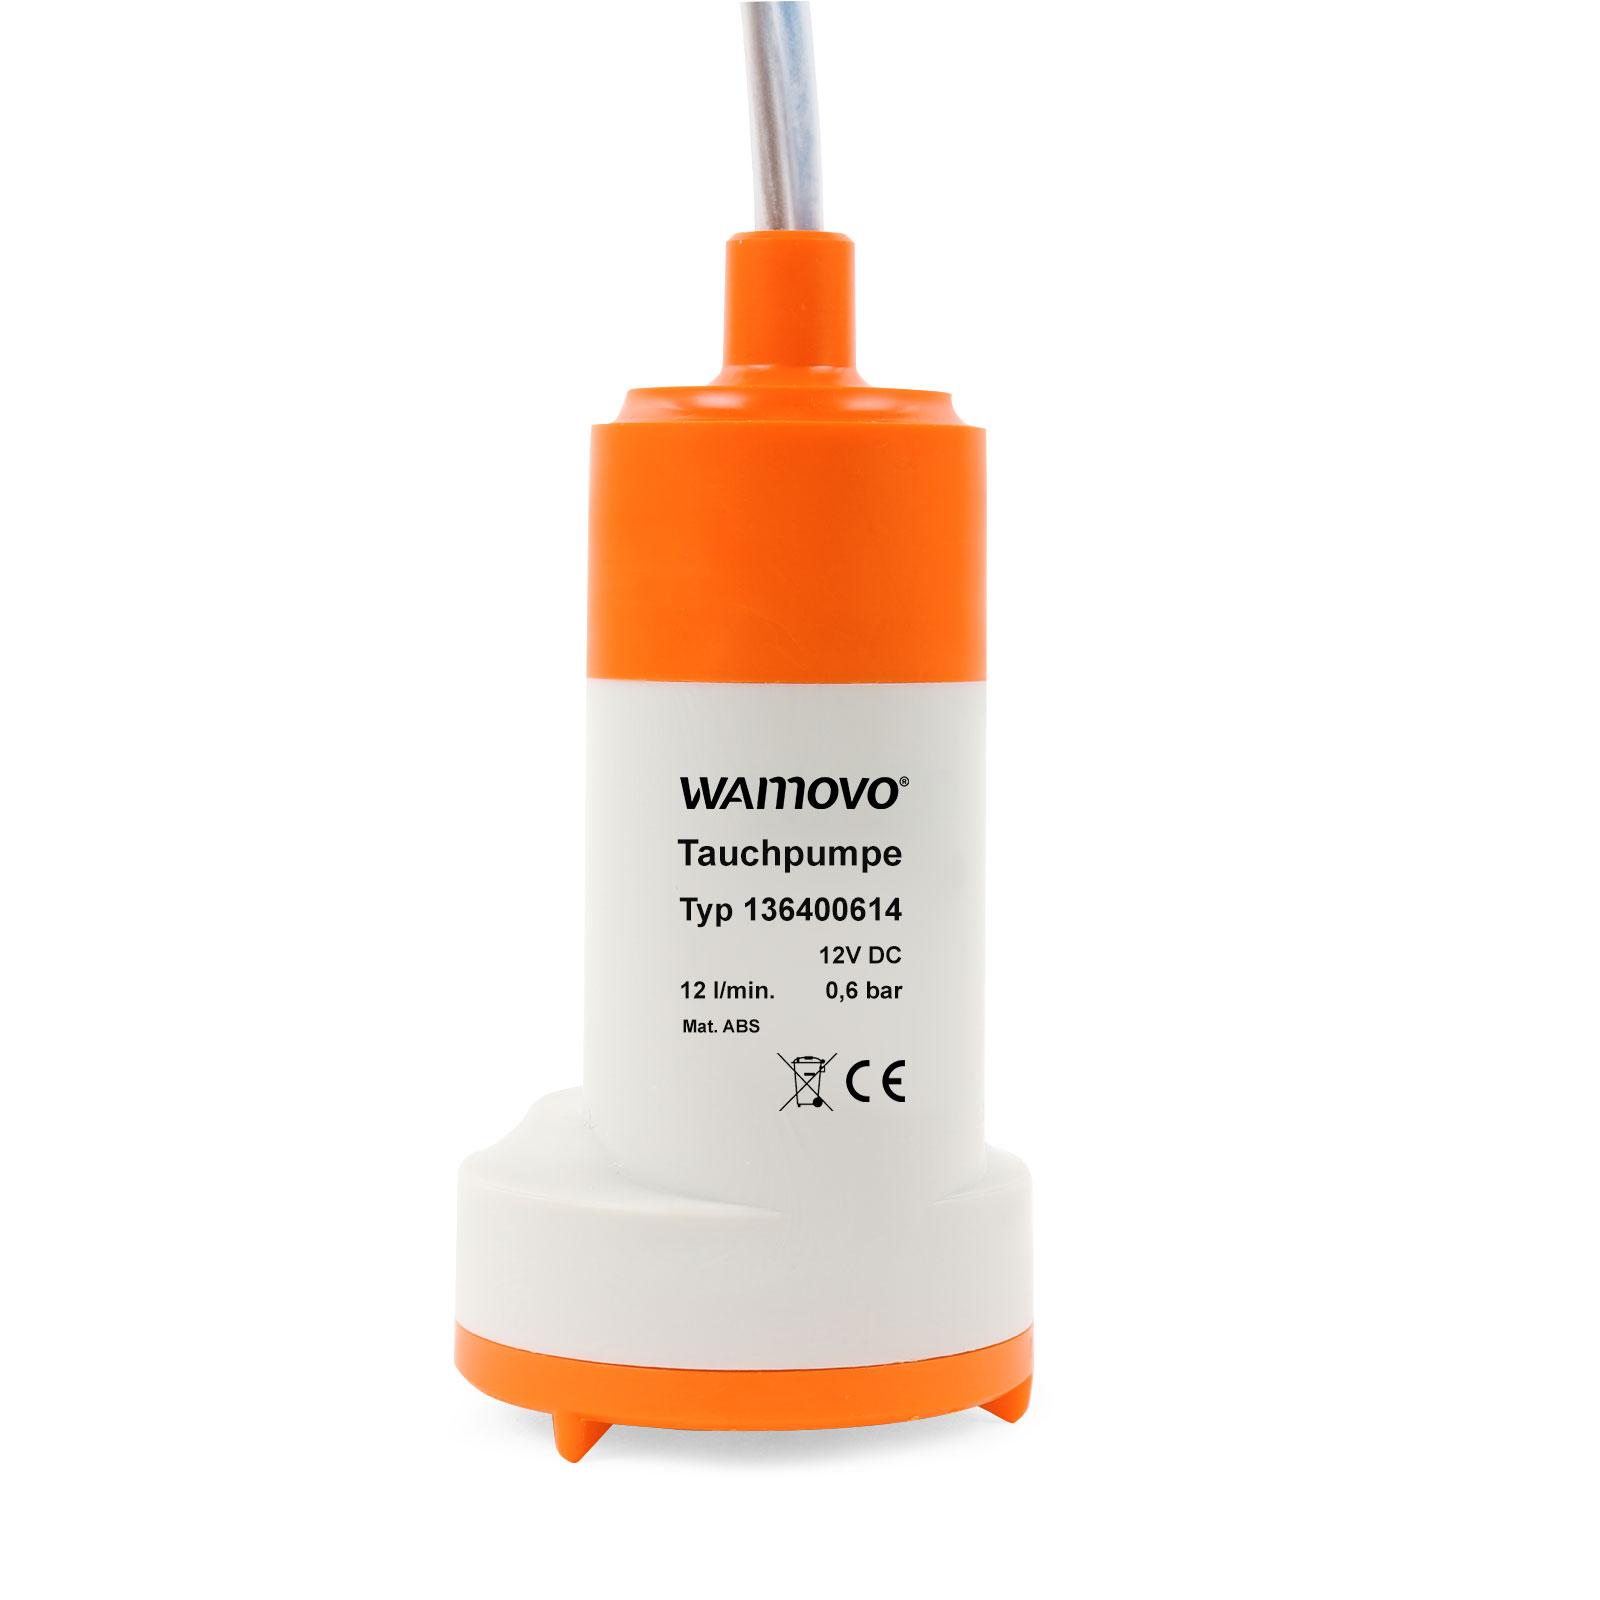 Tauchpumpe 12v 0,6 bar 12 Ltr pro Minute 18-24 Watt Pumpe